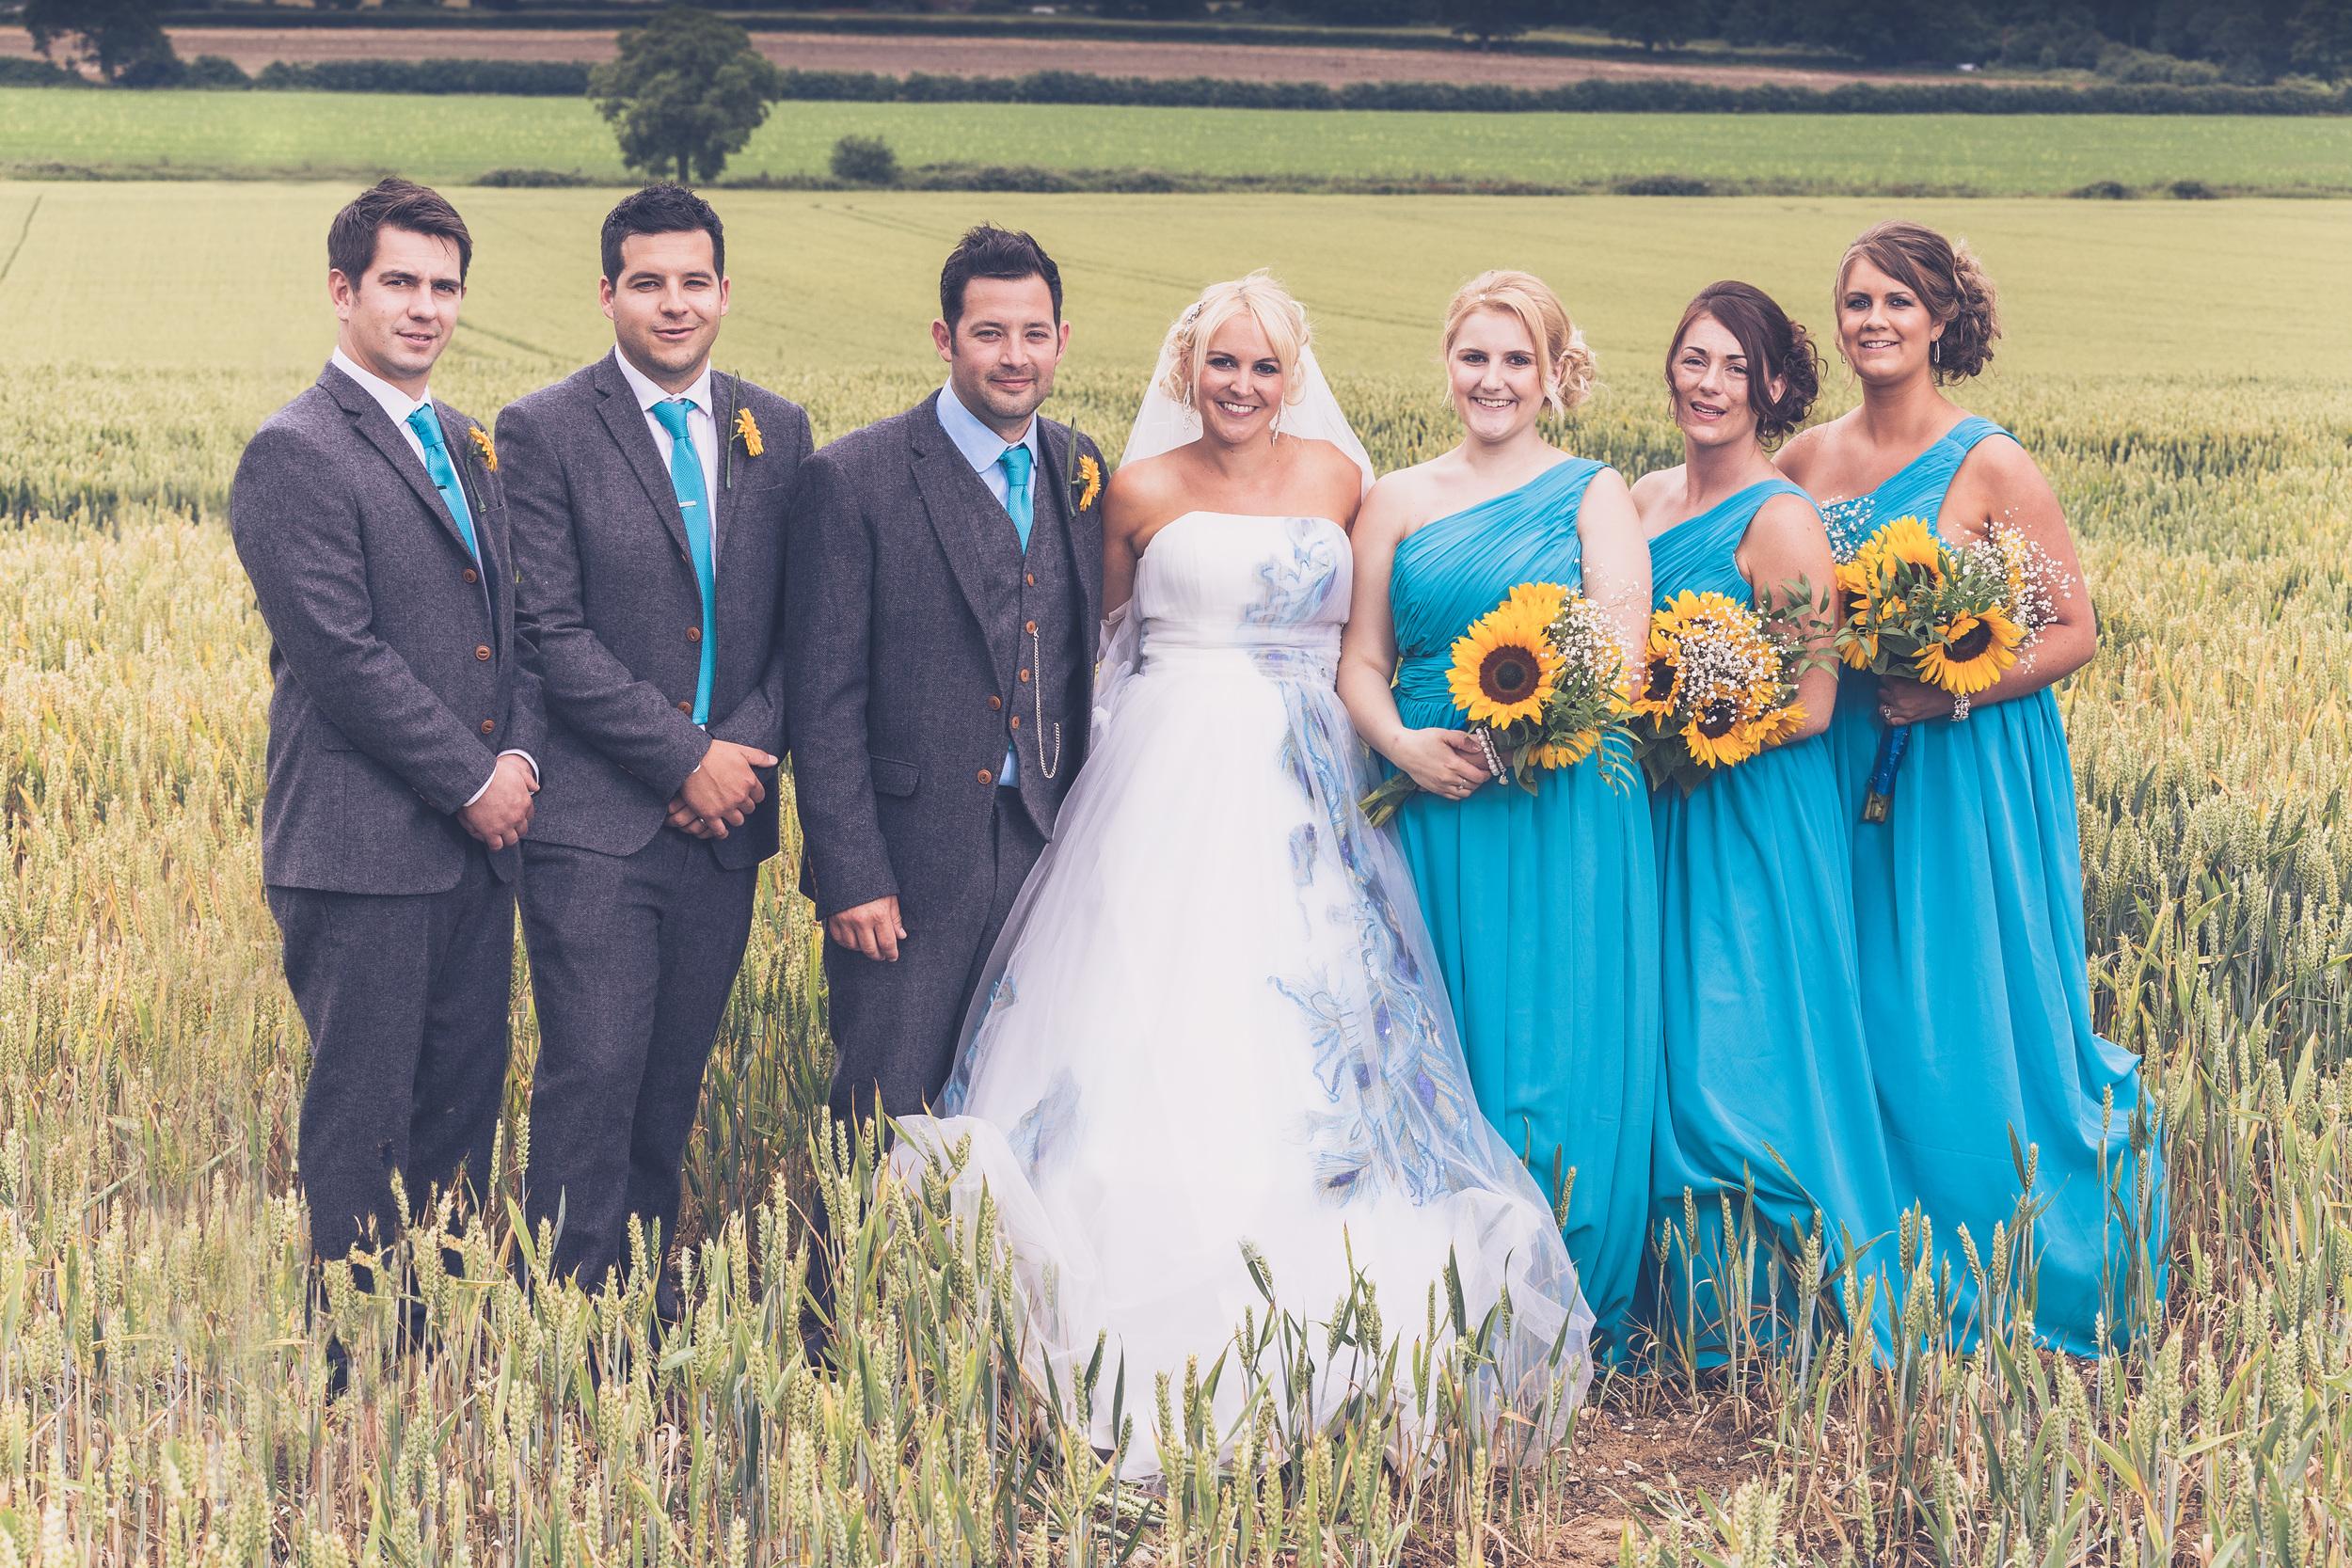 Family Formals - Kent wedding photographer